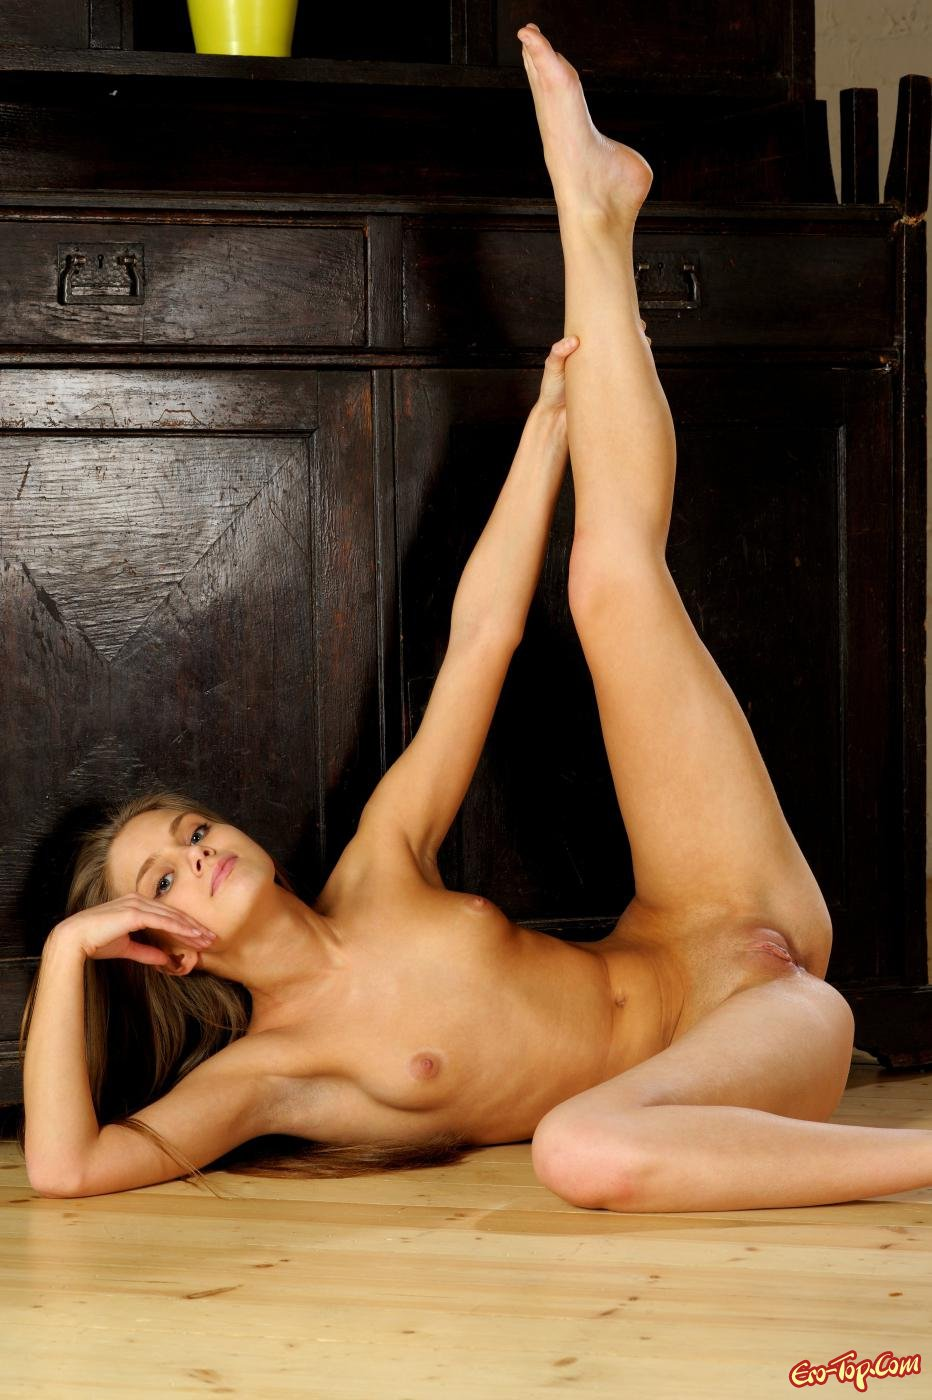 Молодая секси девушка